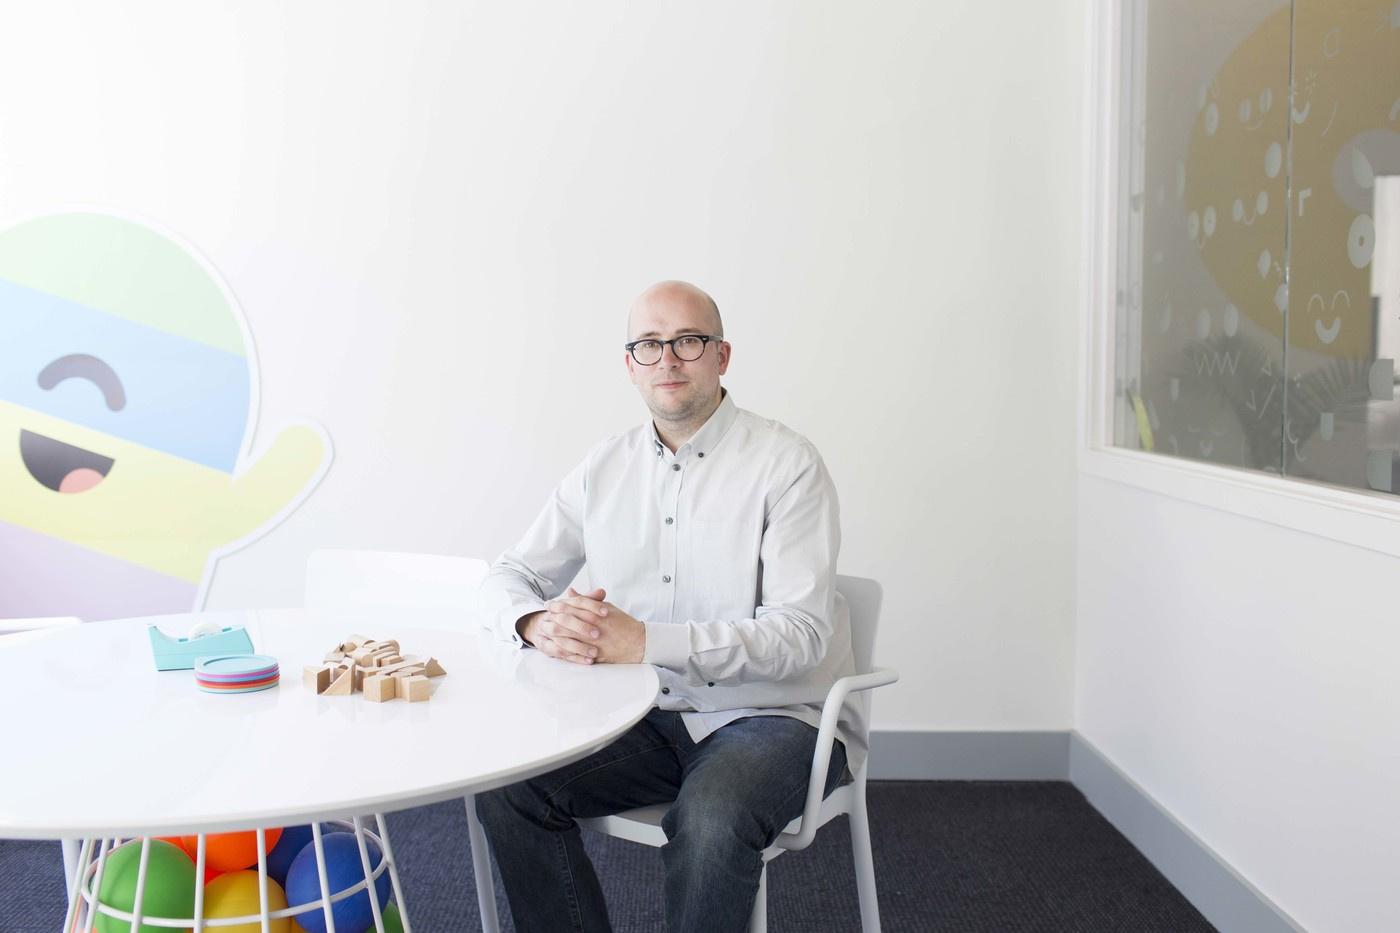 Björn Jeffery, CEO of Toca Boca, for Offscreen Magazine